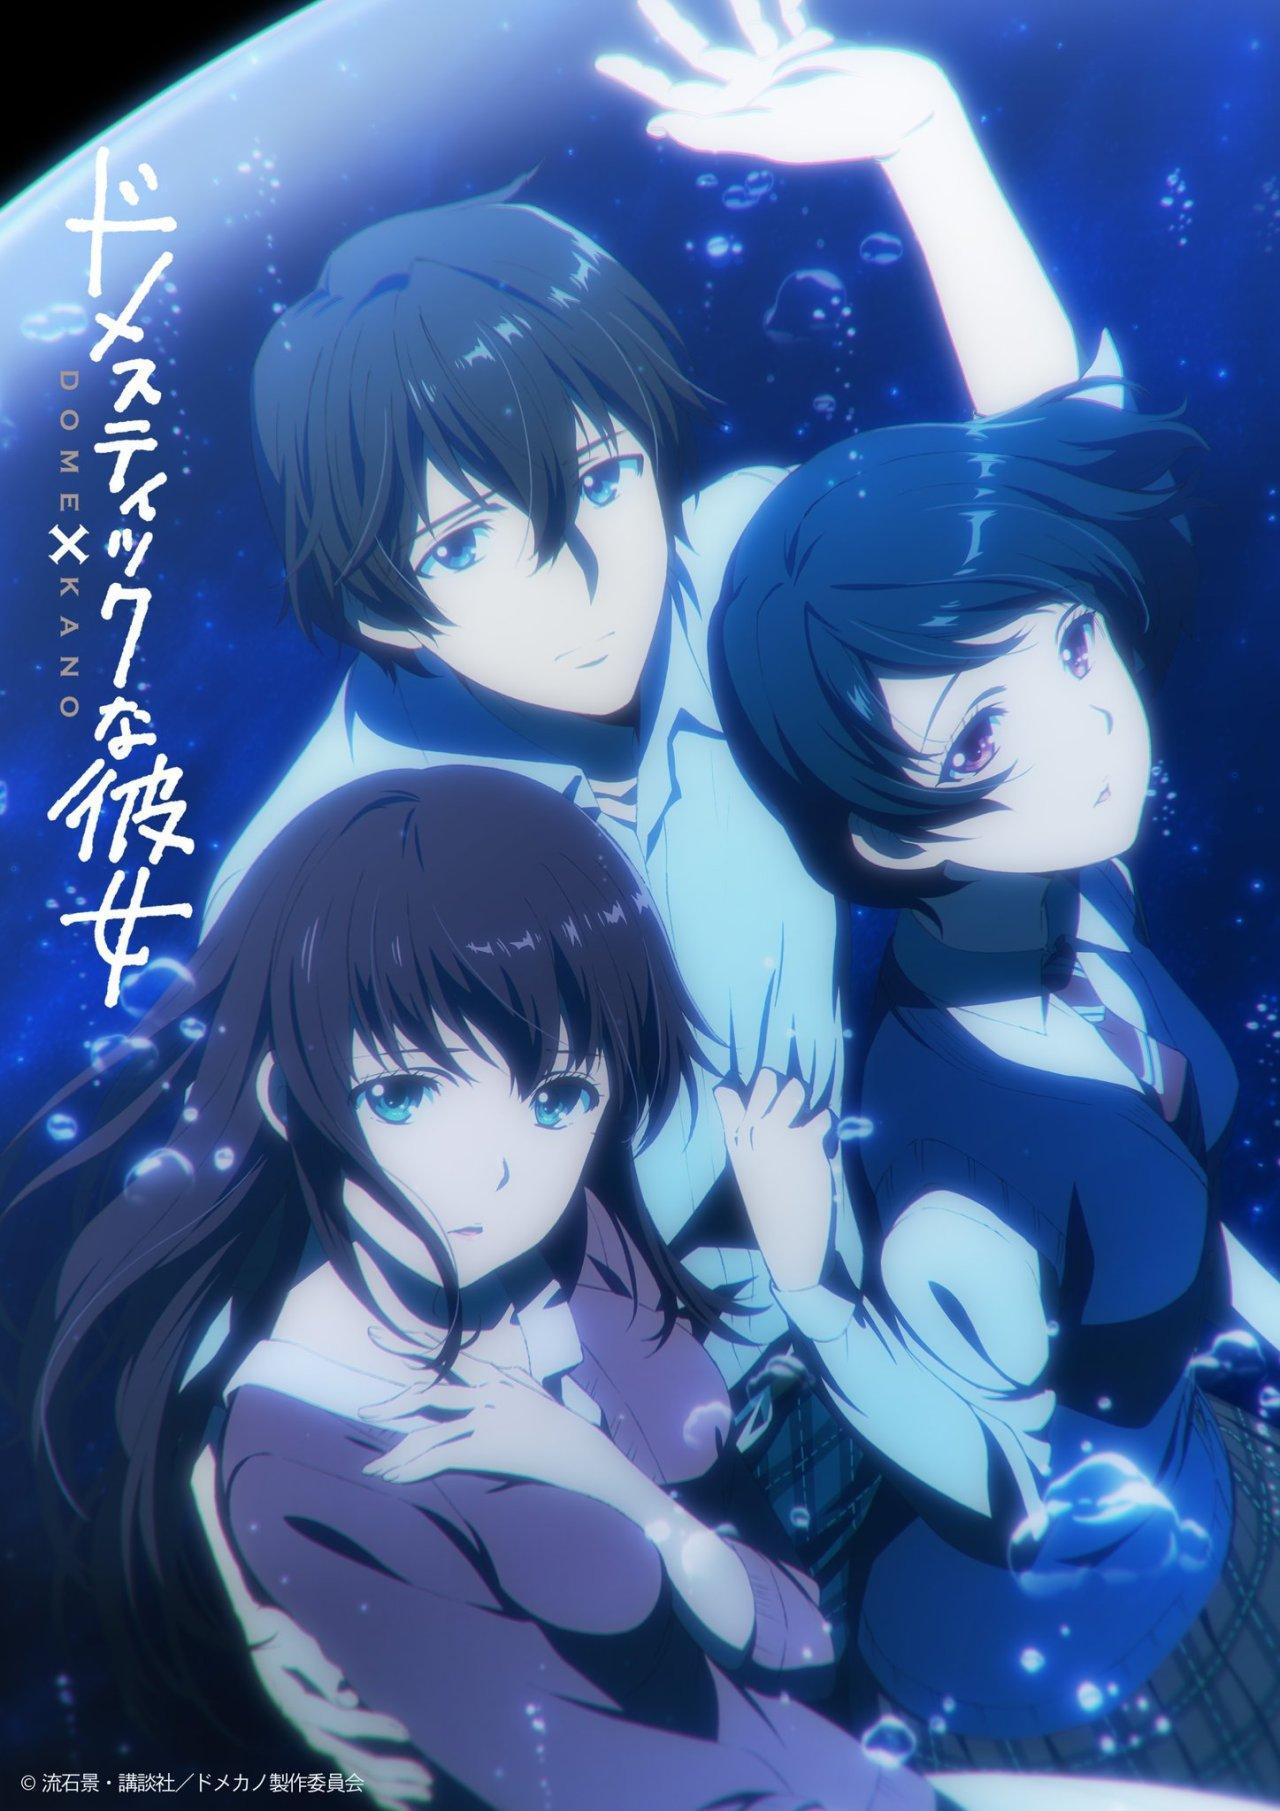 Unduh 46+ Wallpaper Hd Anime Tersenyum HD Paling Keren